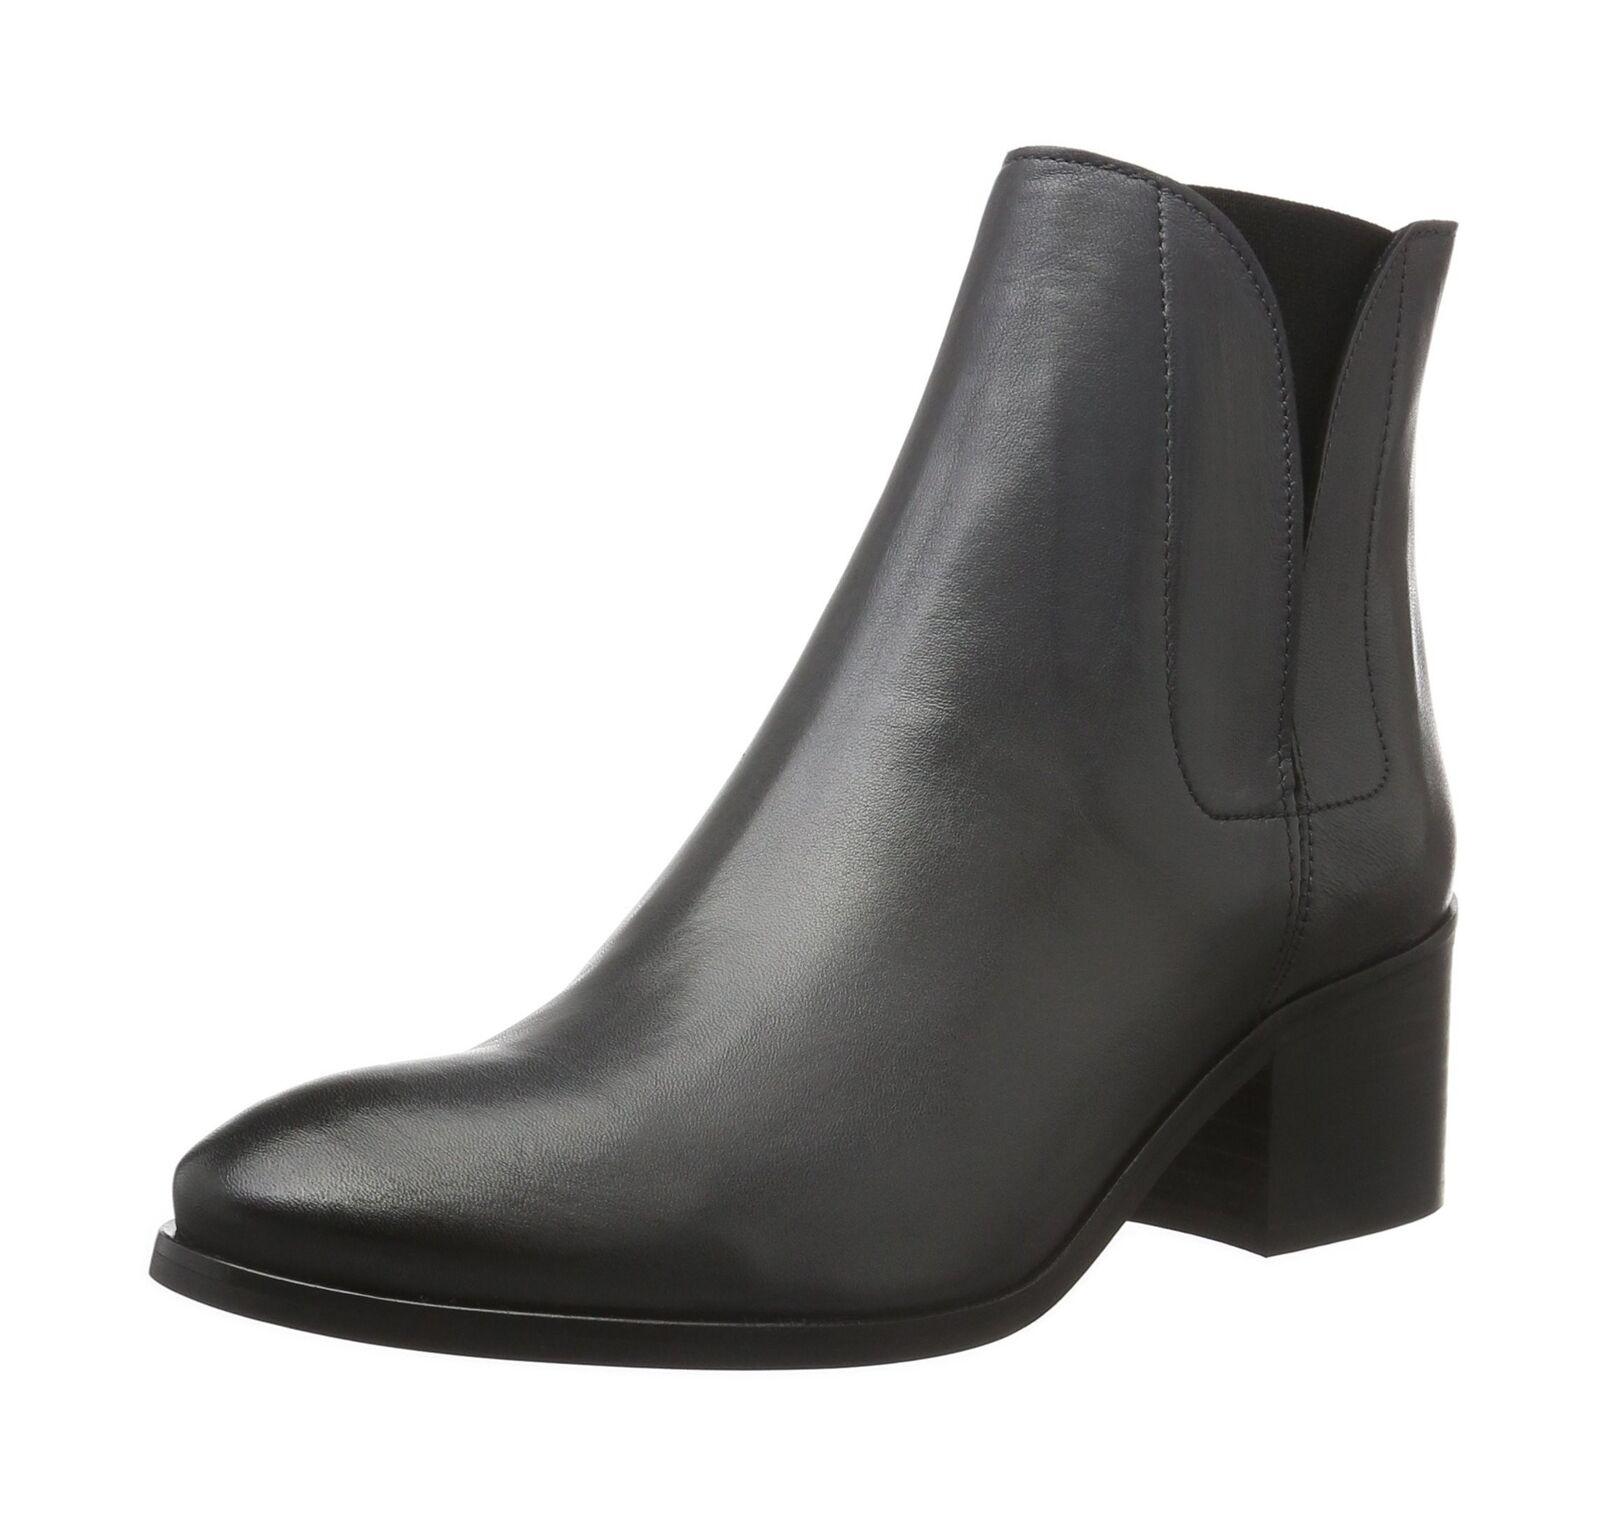 Buffalo para mujer Negro es 30761 Mestico Tobillo Botas Negro mujer (Chiara 01) 5 Reino Unido 896cec